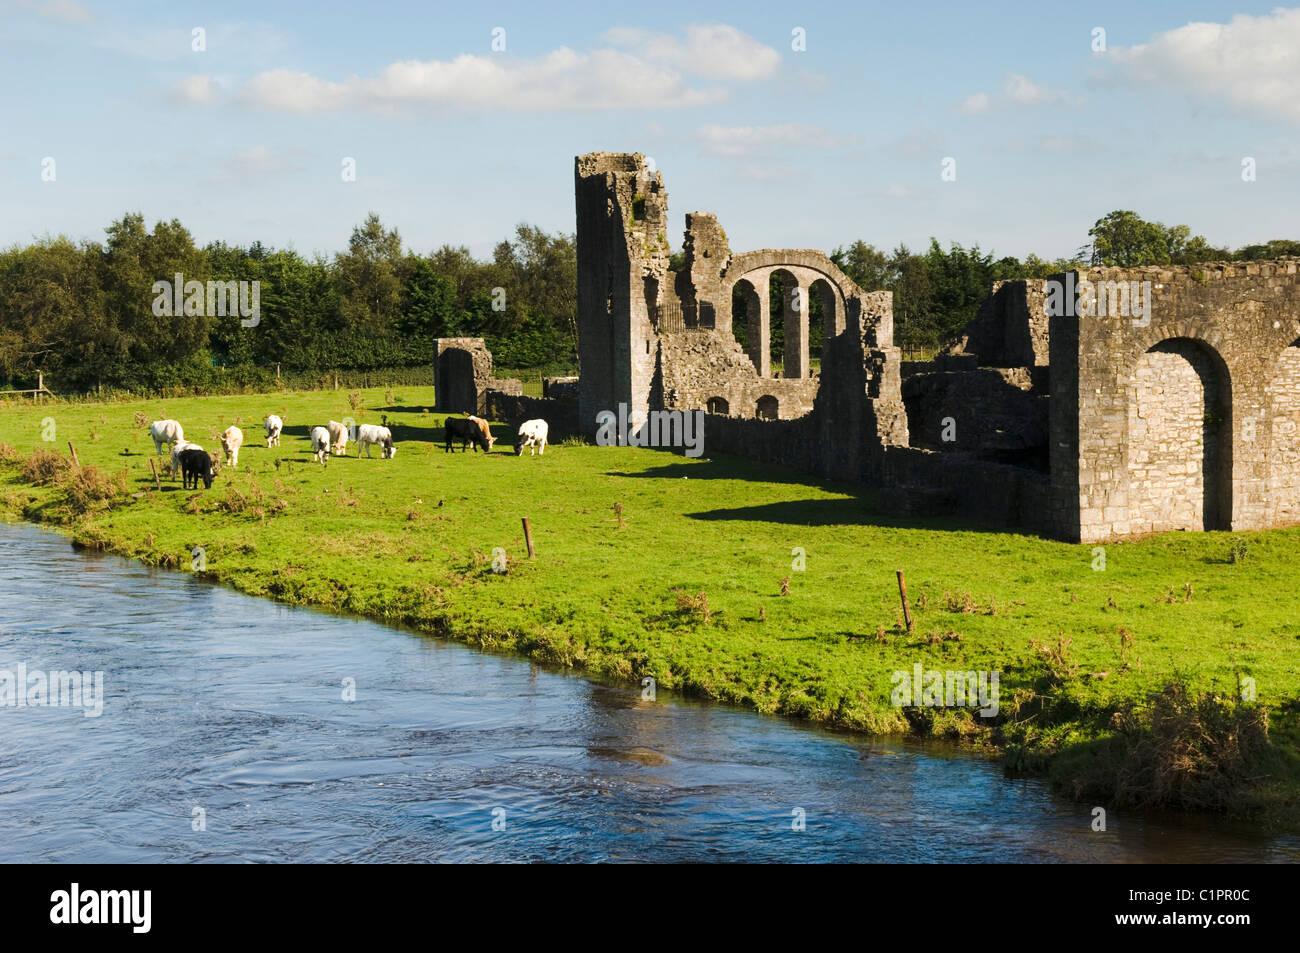 Republic of Ireland, Boyne Valley, Priory of St. John the Baptist - Stock Image